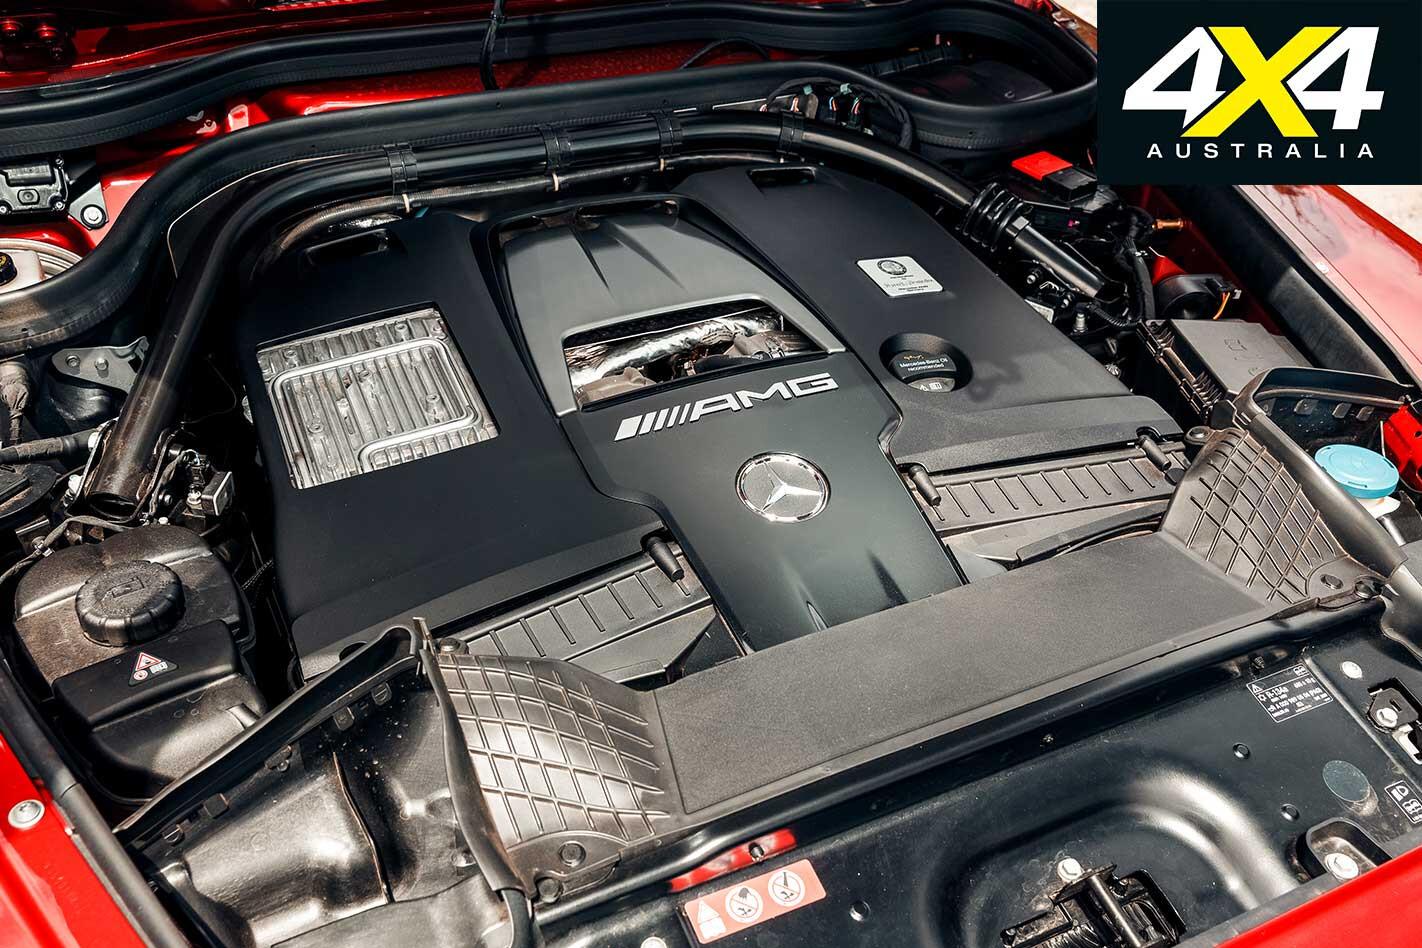 2019 Mercedes AMG G 63 Engine Jpg